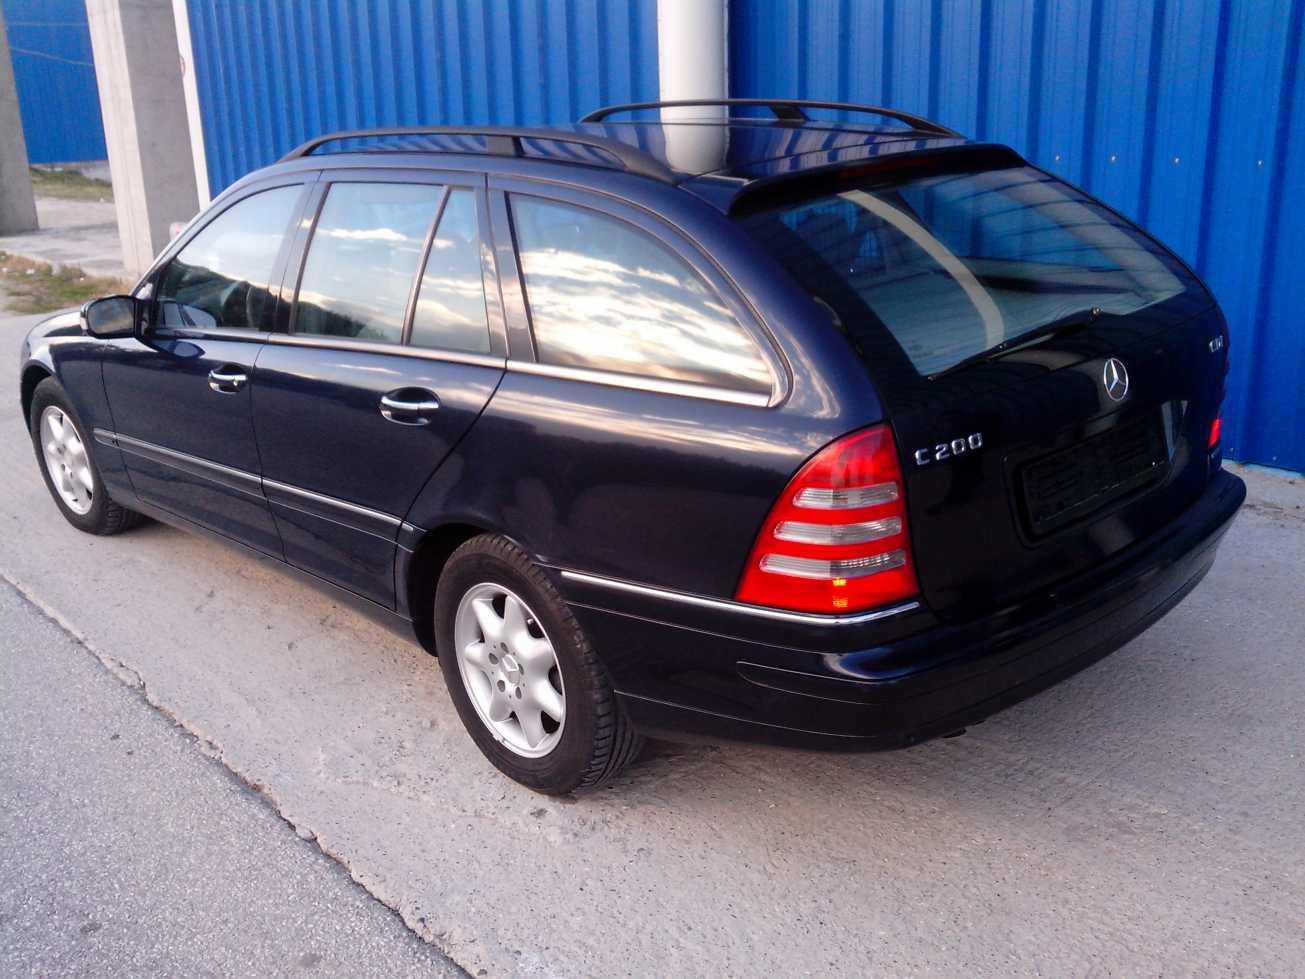 Okazion mercedes benz 200 cdi eleganc viti 2002 for Mercedes benz viti